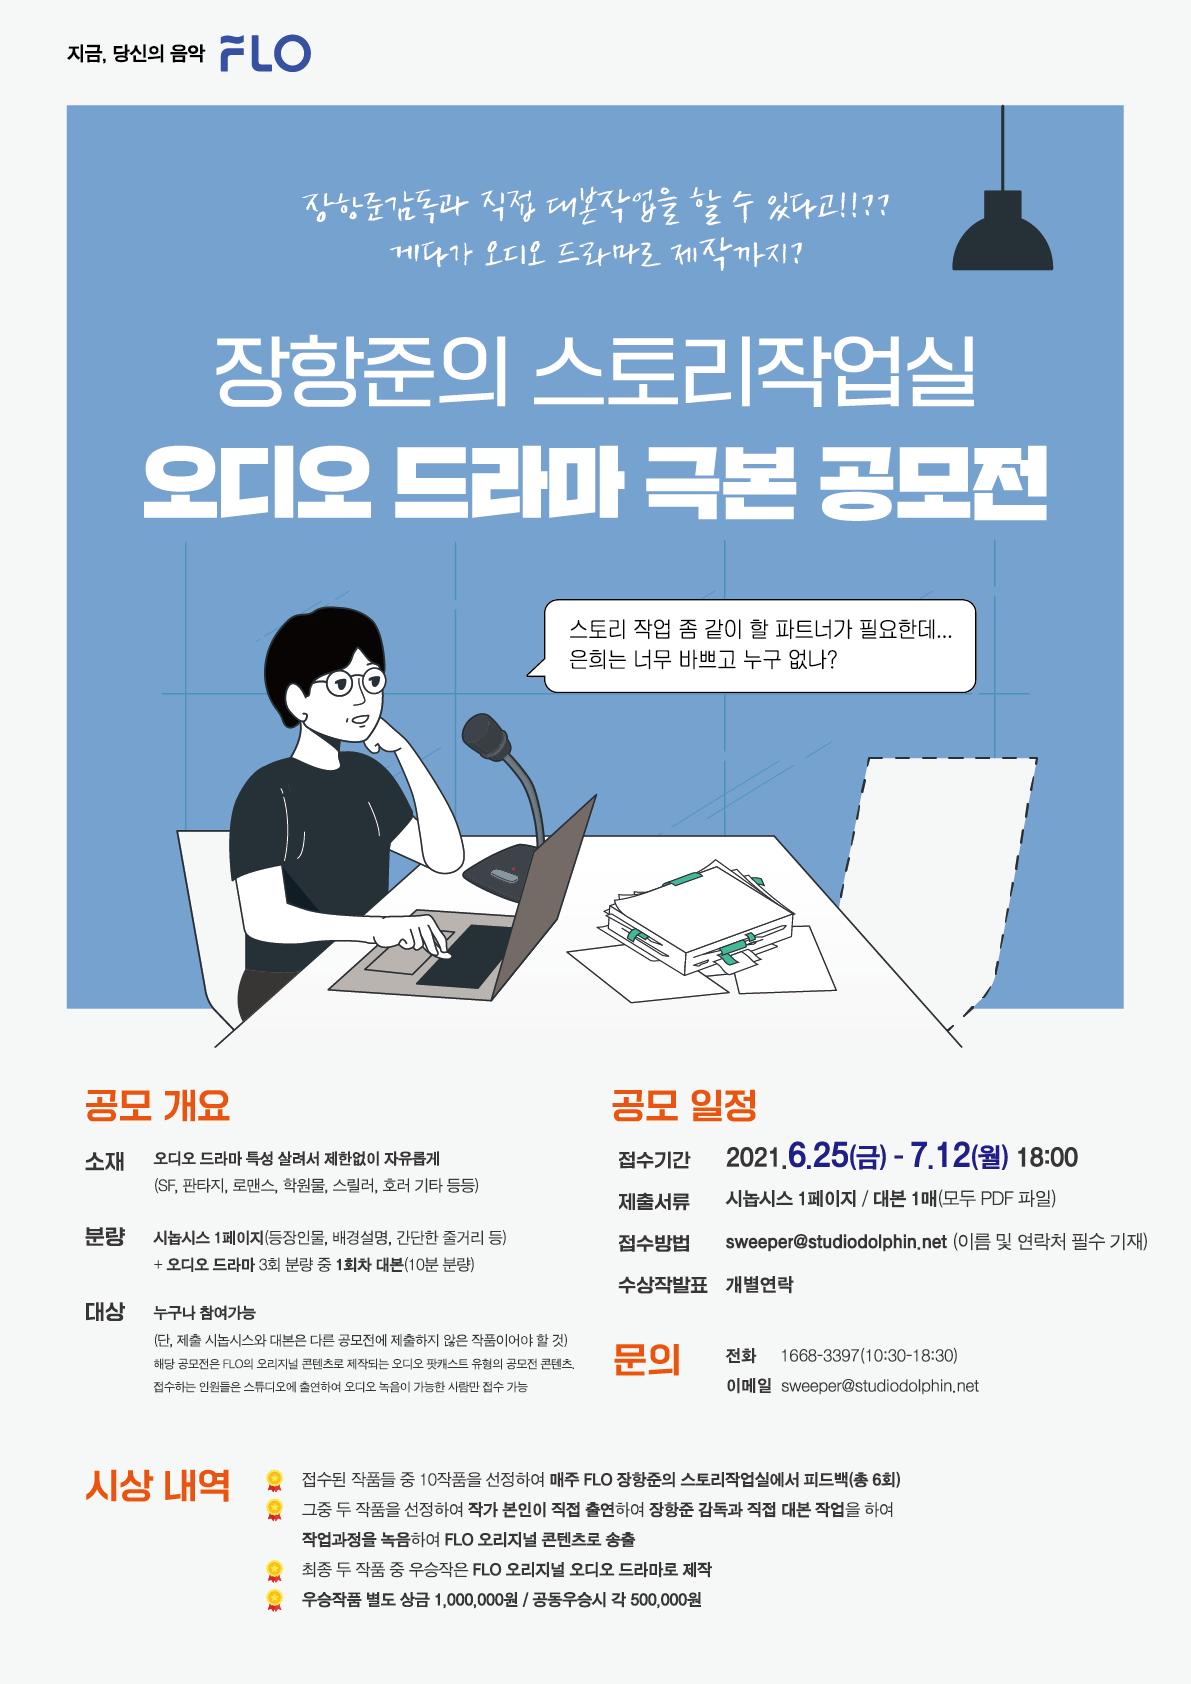 FLO - 장항준의 스토리작업실 오디오 드라마 극본 공모전